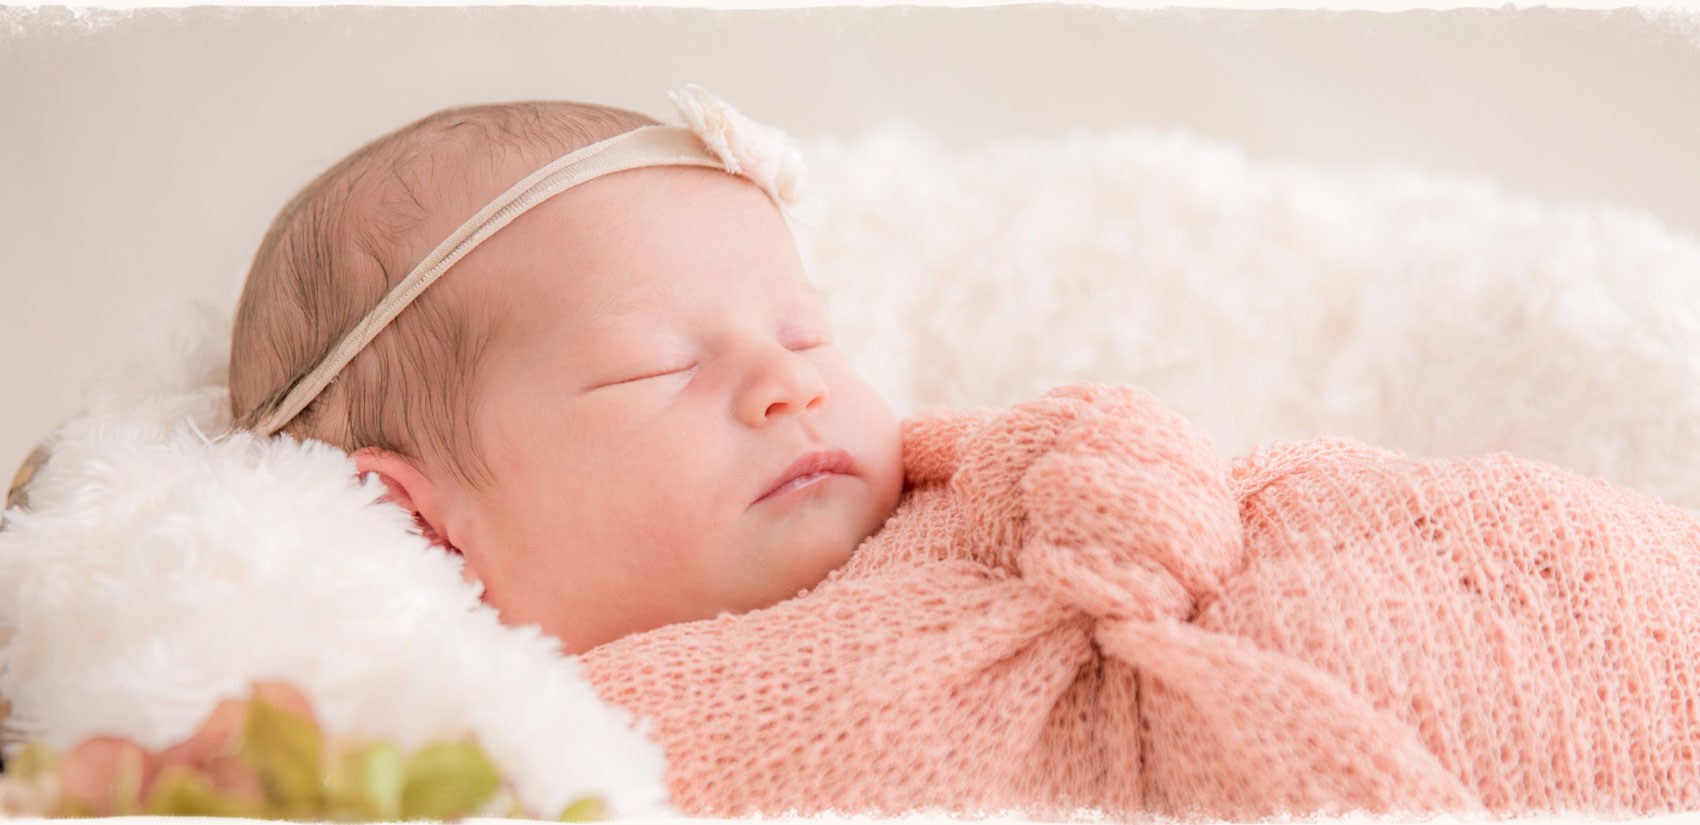 Babyfotos Birte Wührmann Fotografie